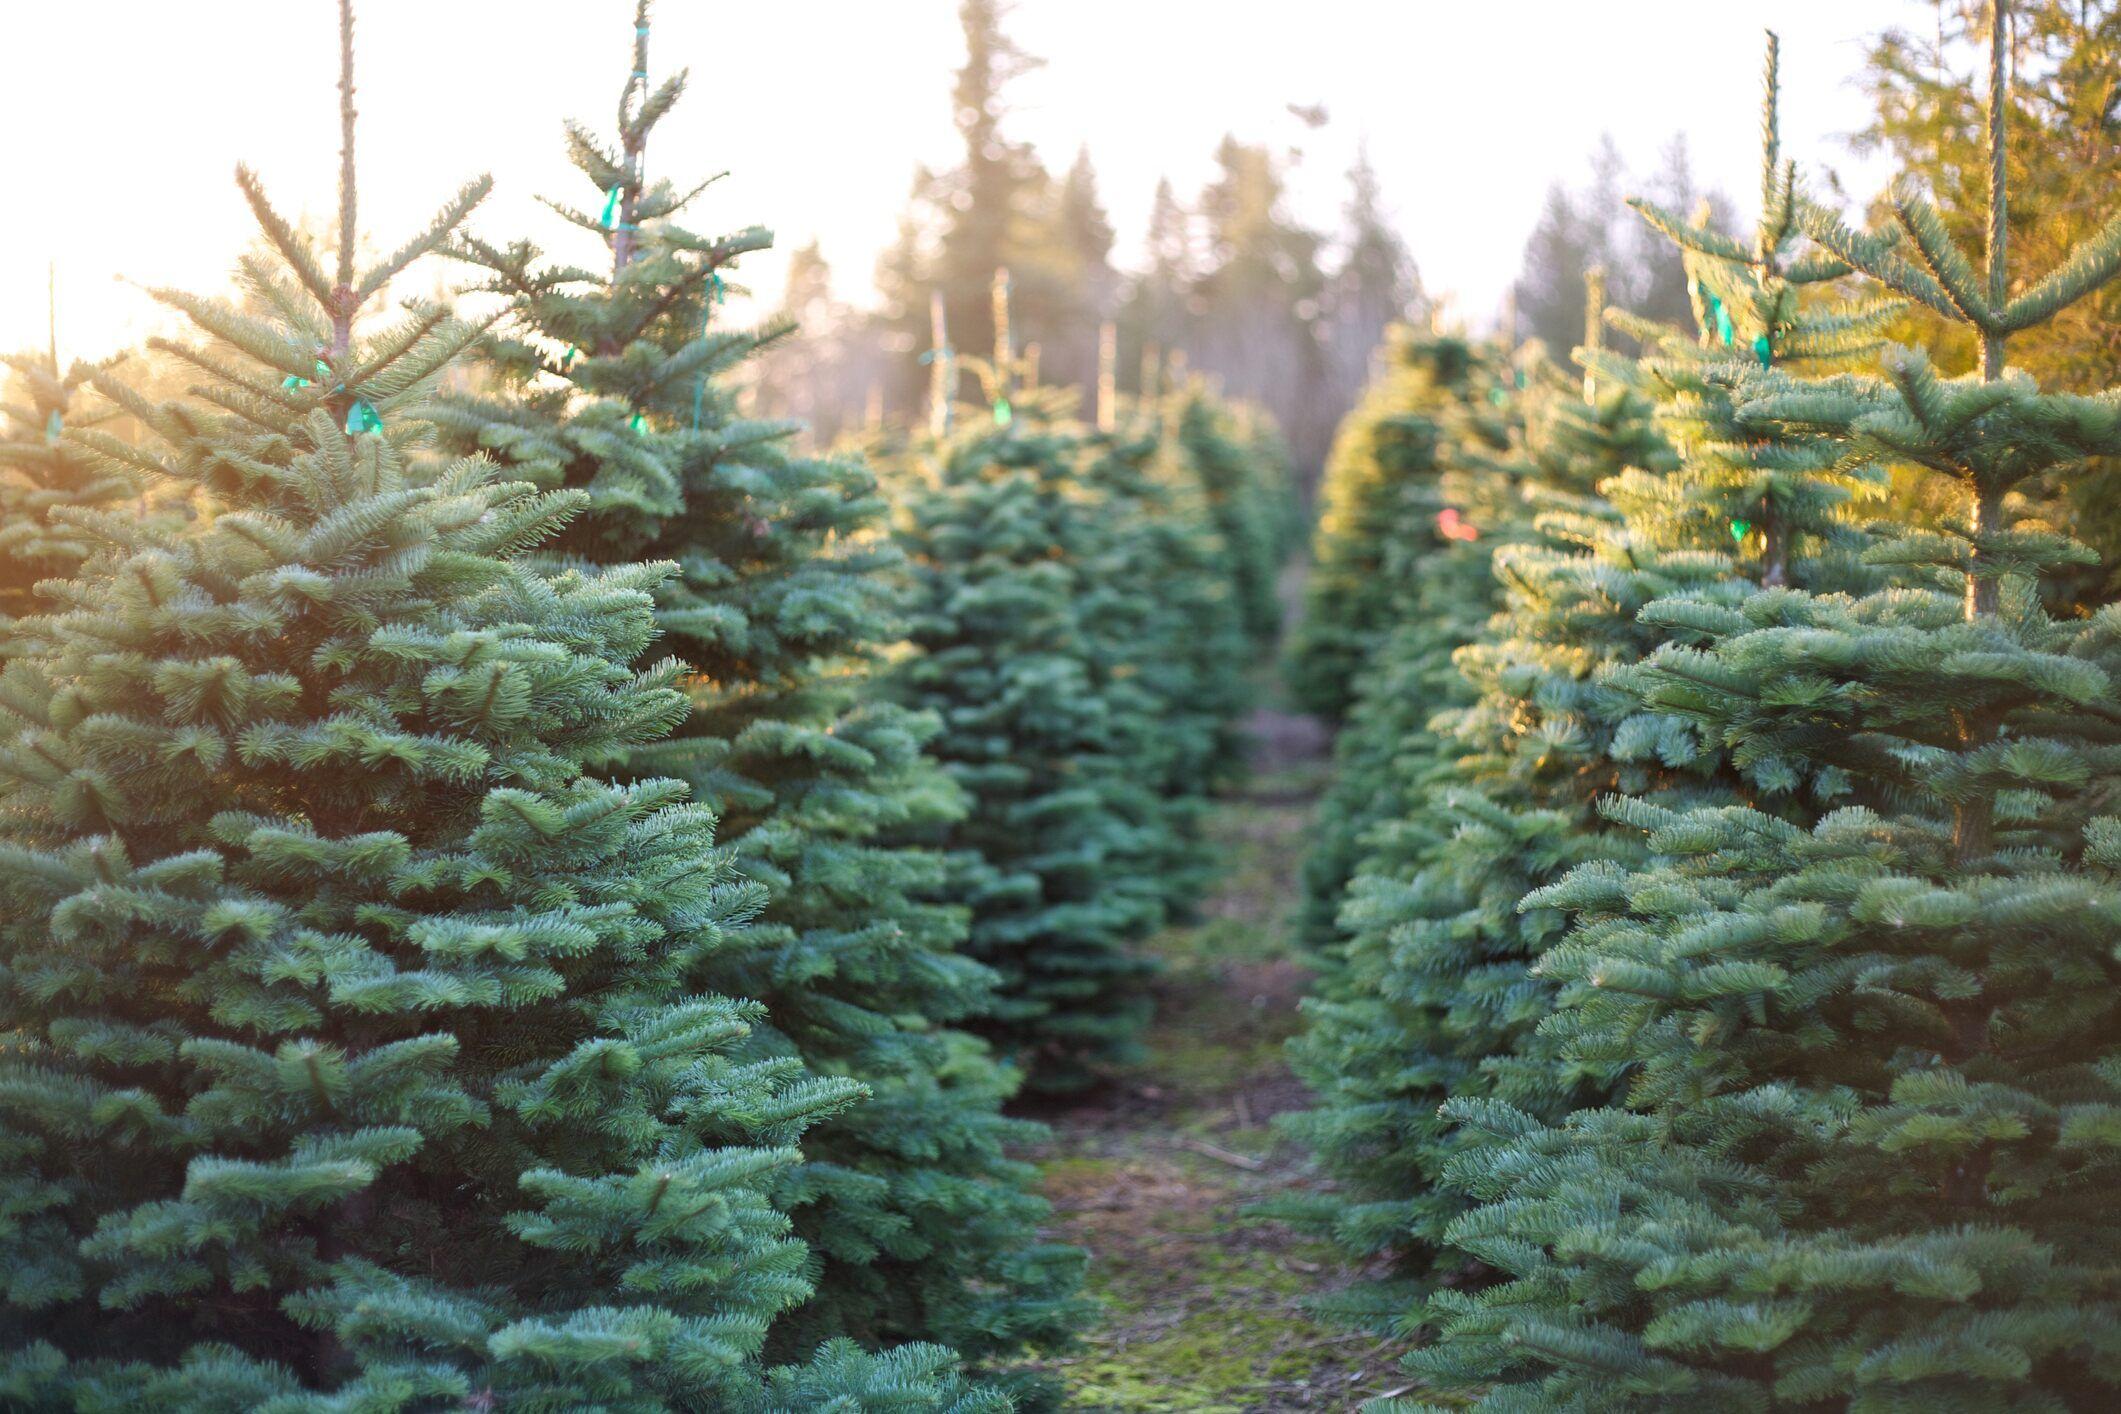 Fox News How To Keep A Christmas Tree Alive Throughout The Season Christmas Tree Farm Cool Christmas Trees Tree Farms